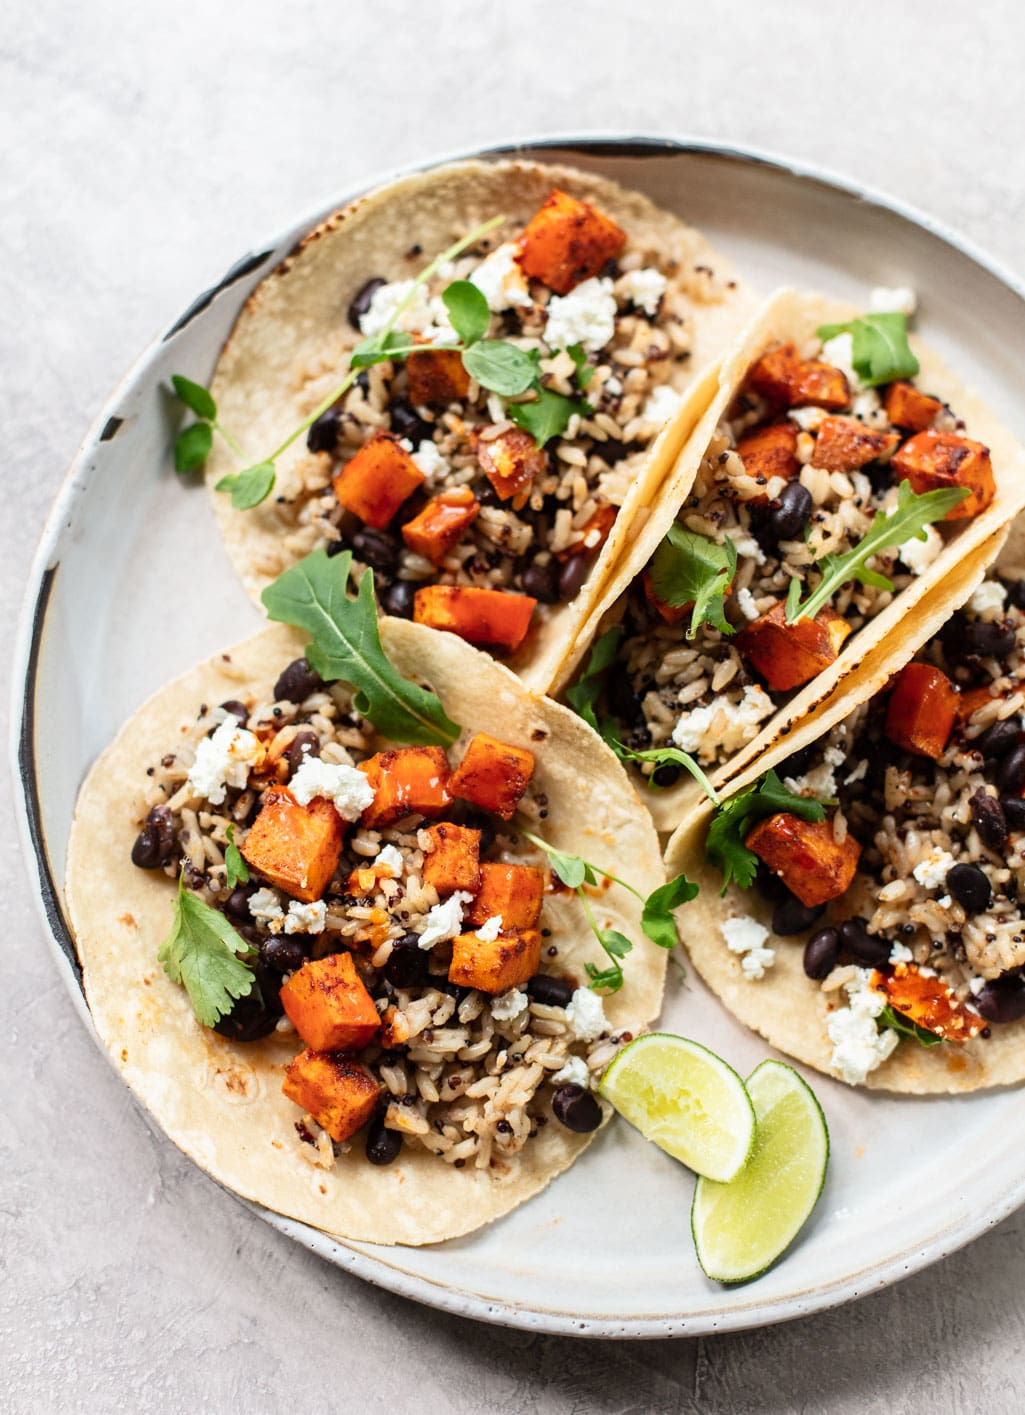 Chipotle Sweet Potato and Black Bean Tacos